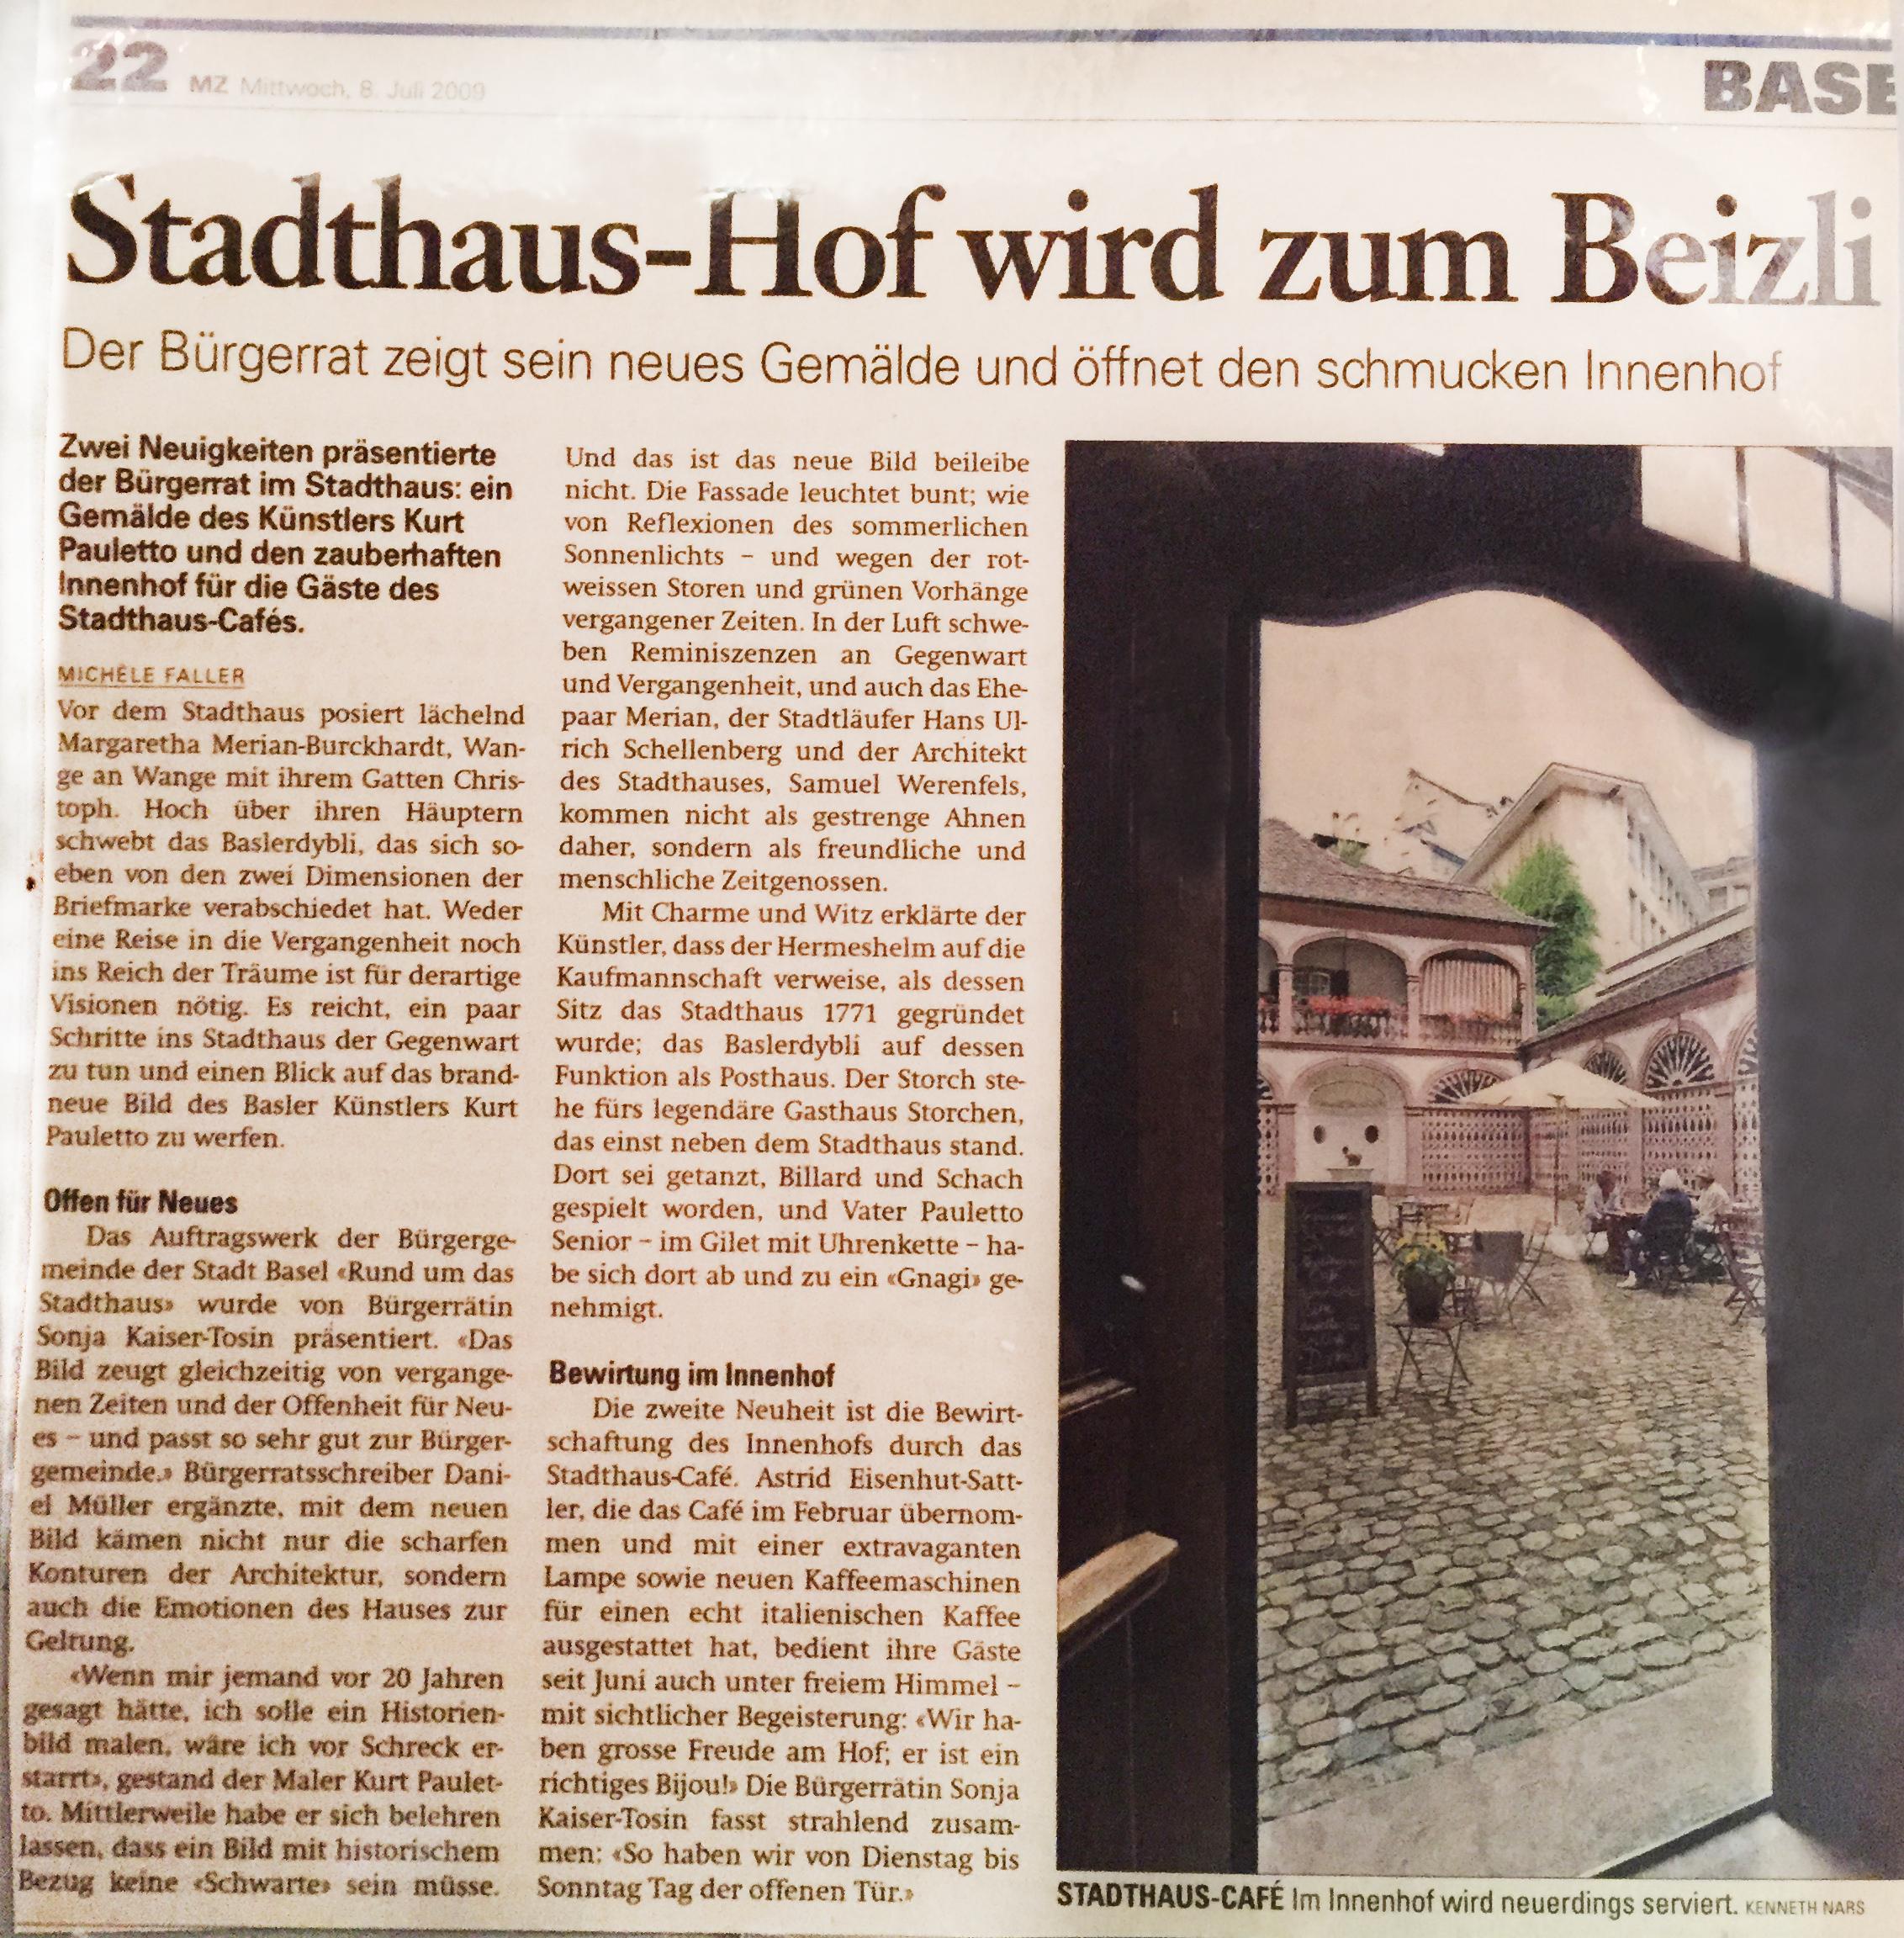 stadthauscafe_3.jpg